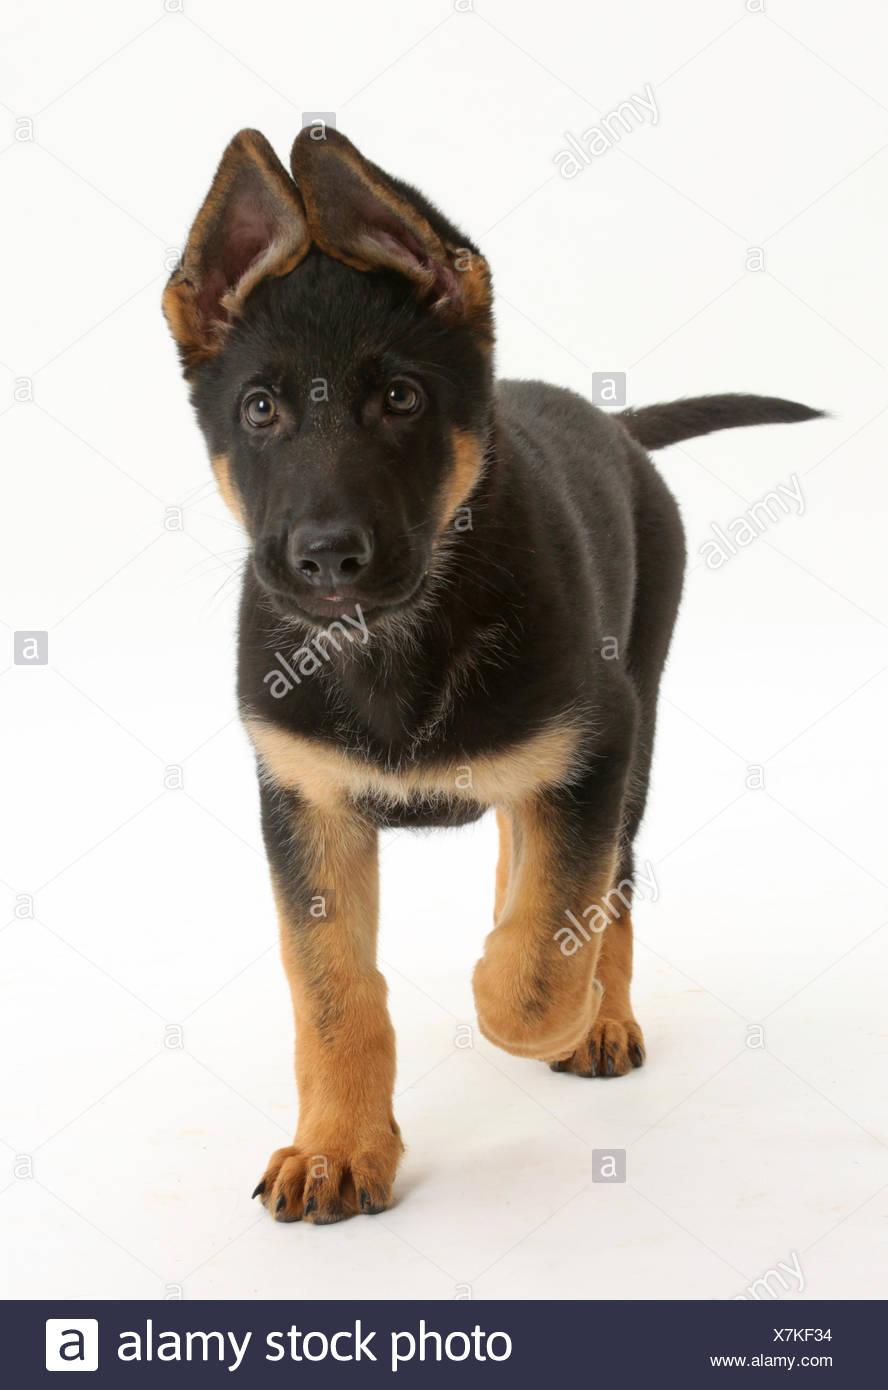 German Shepherd Dog puppy, age 8 weeks, walking. - Stock Image